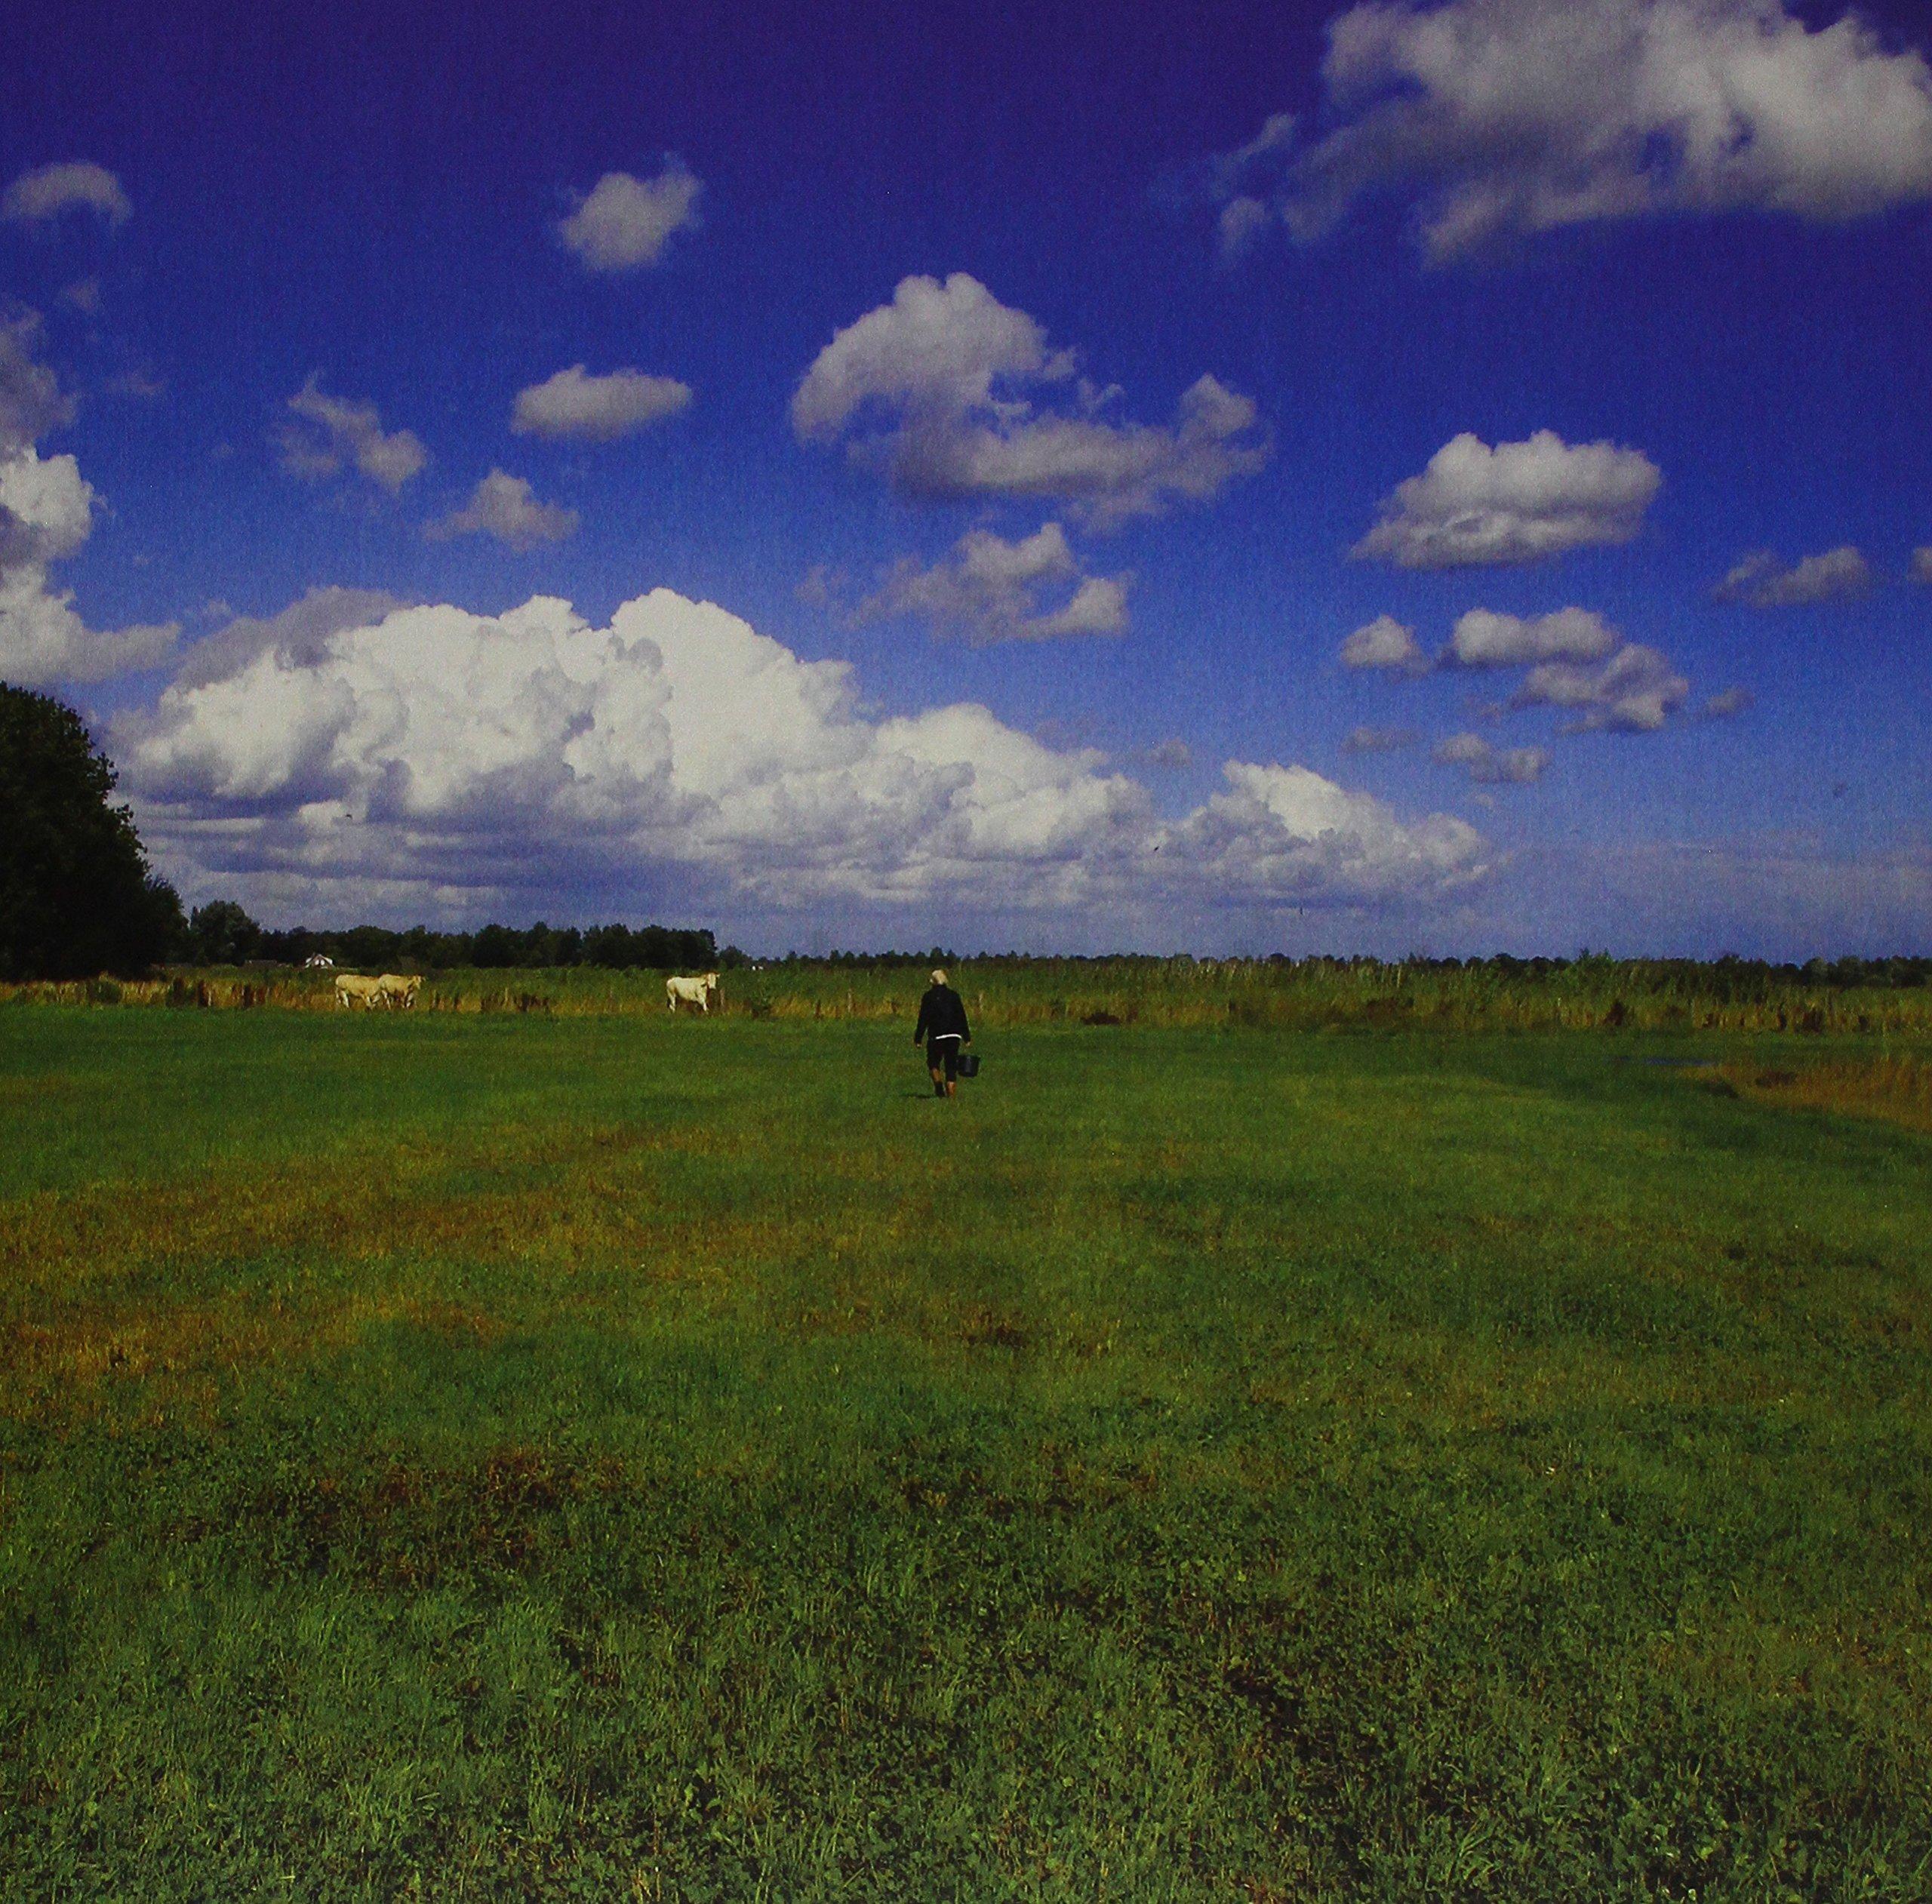 Vinilo : Biosphere - The Hilvarenbeek Recordings (LP Vinyl)